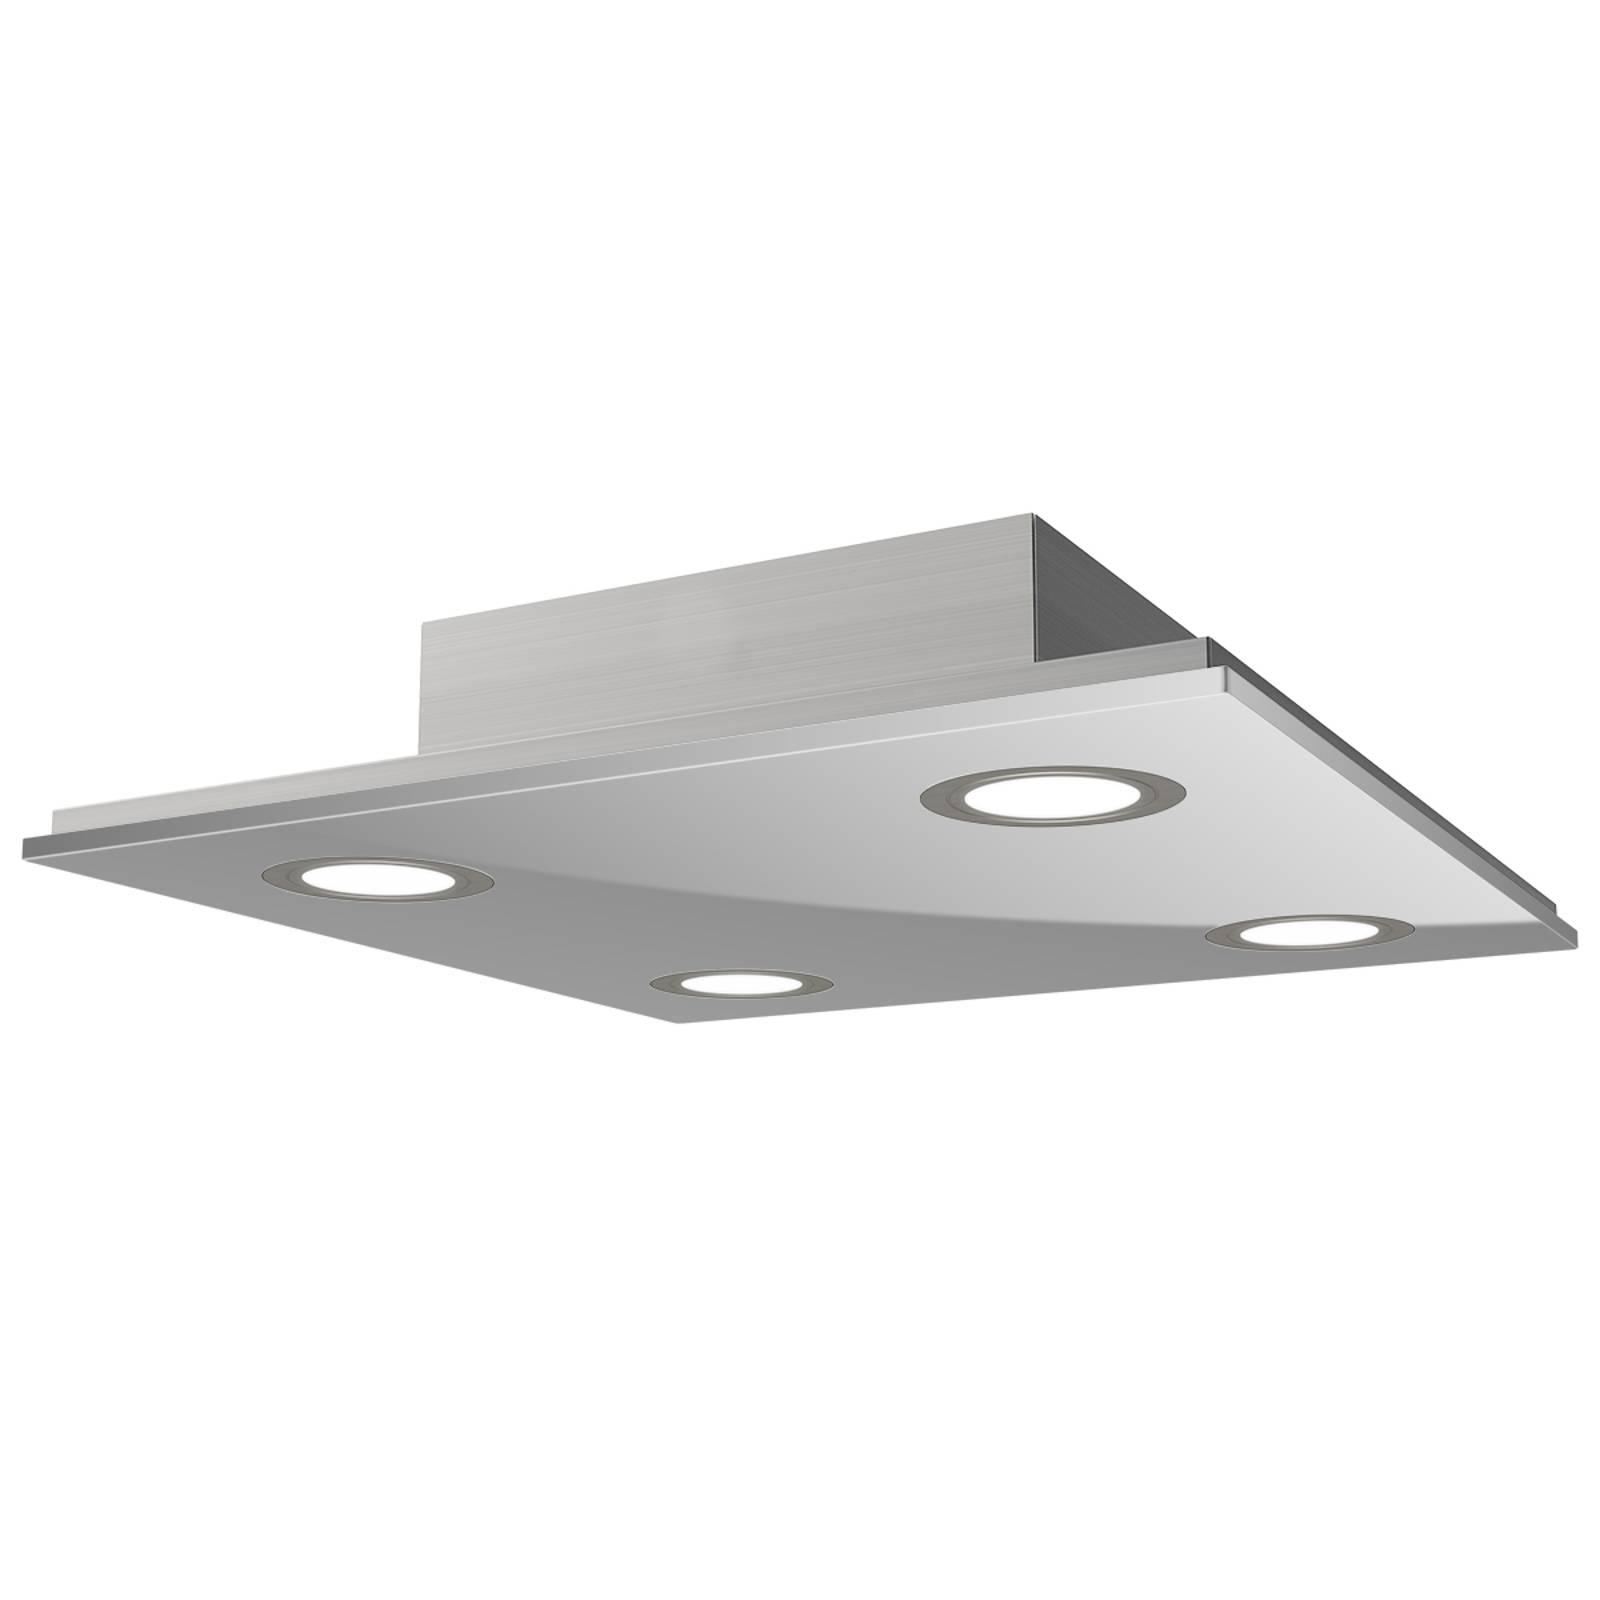 Kwadratowa lampa sufitowa LED Pano, metal